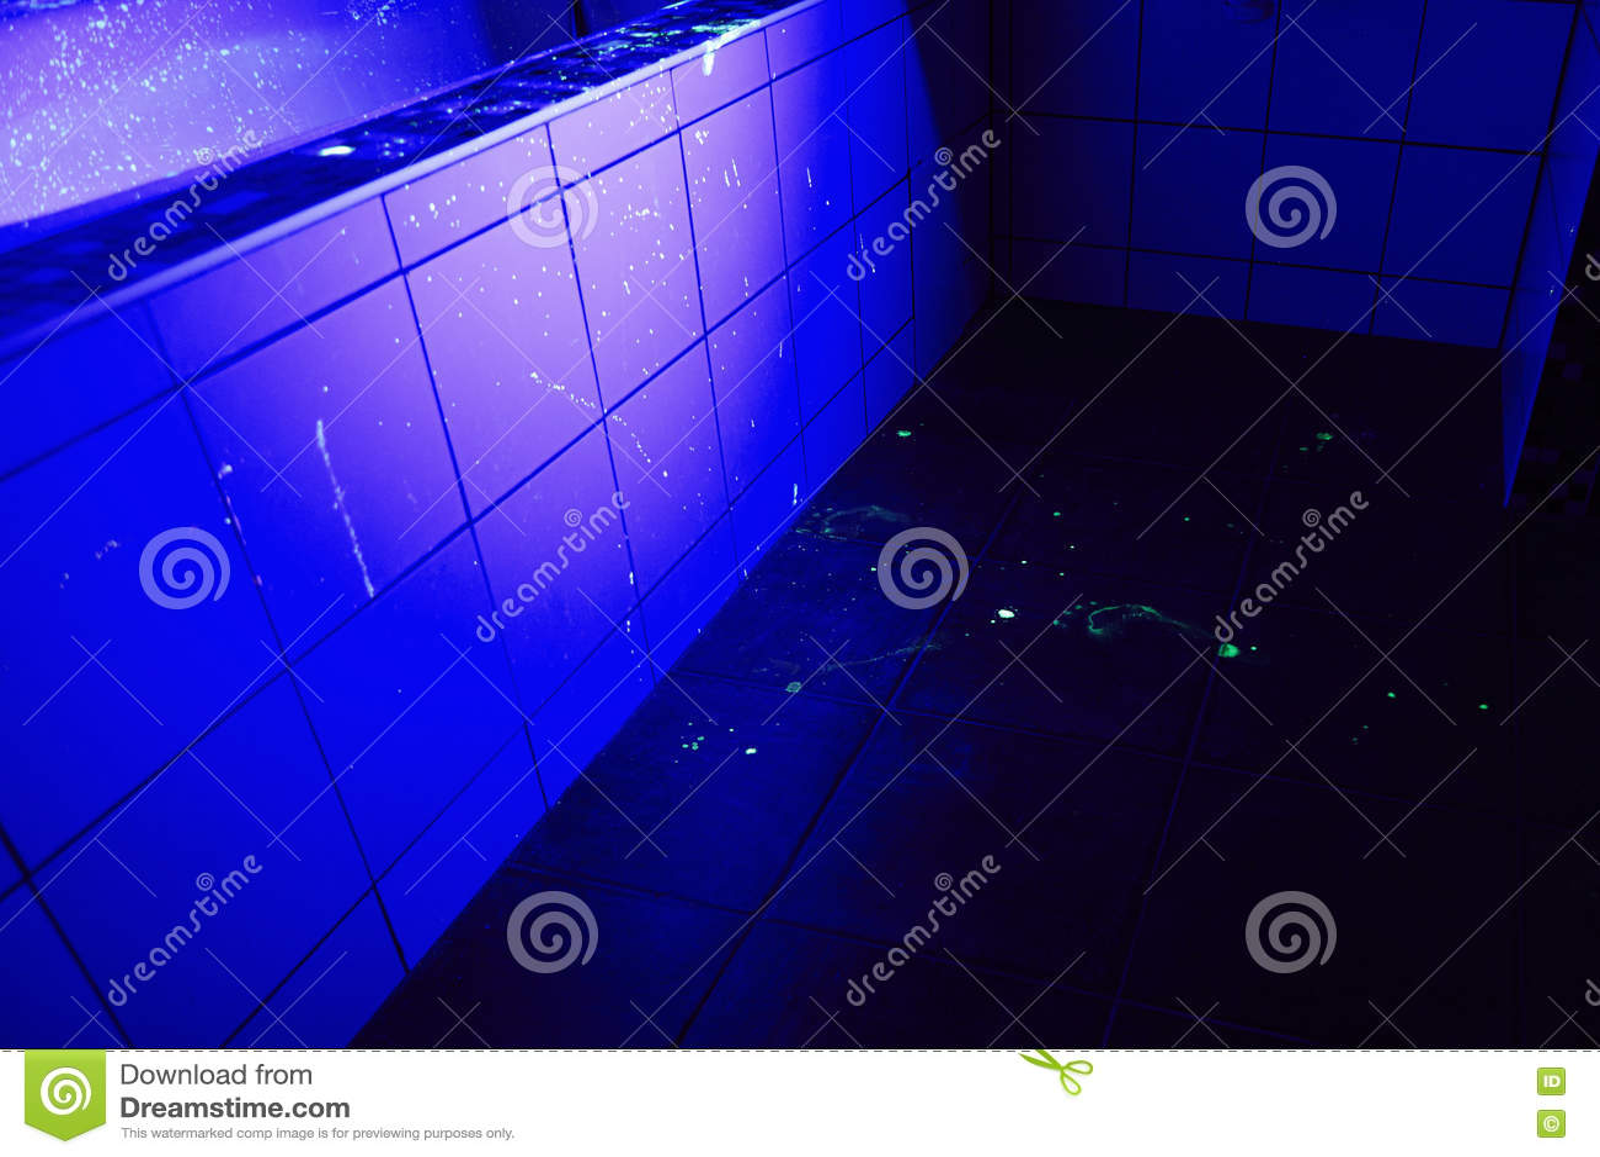 Badkamers als plaats van misdaad